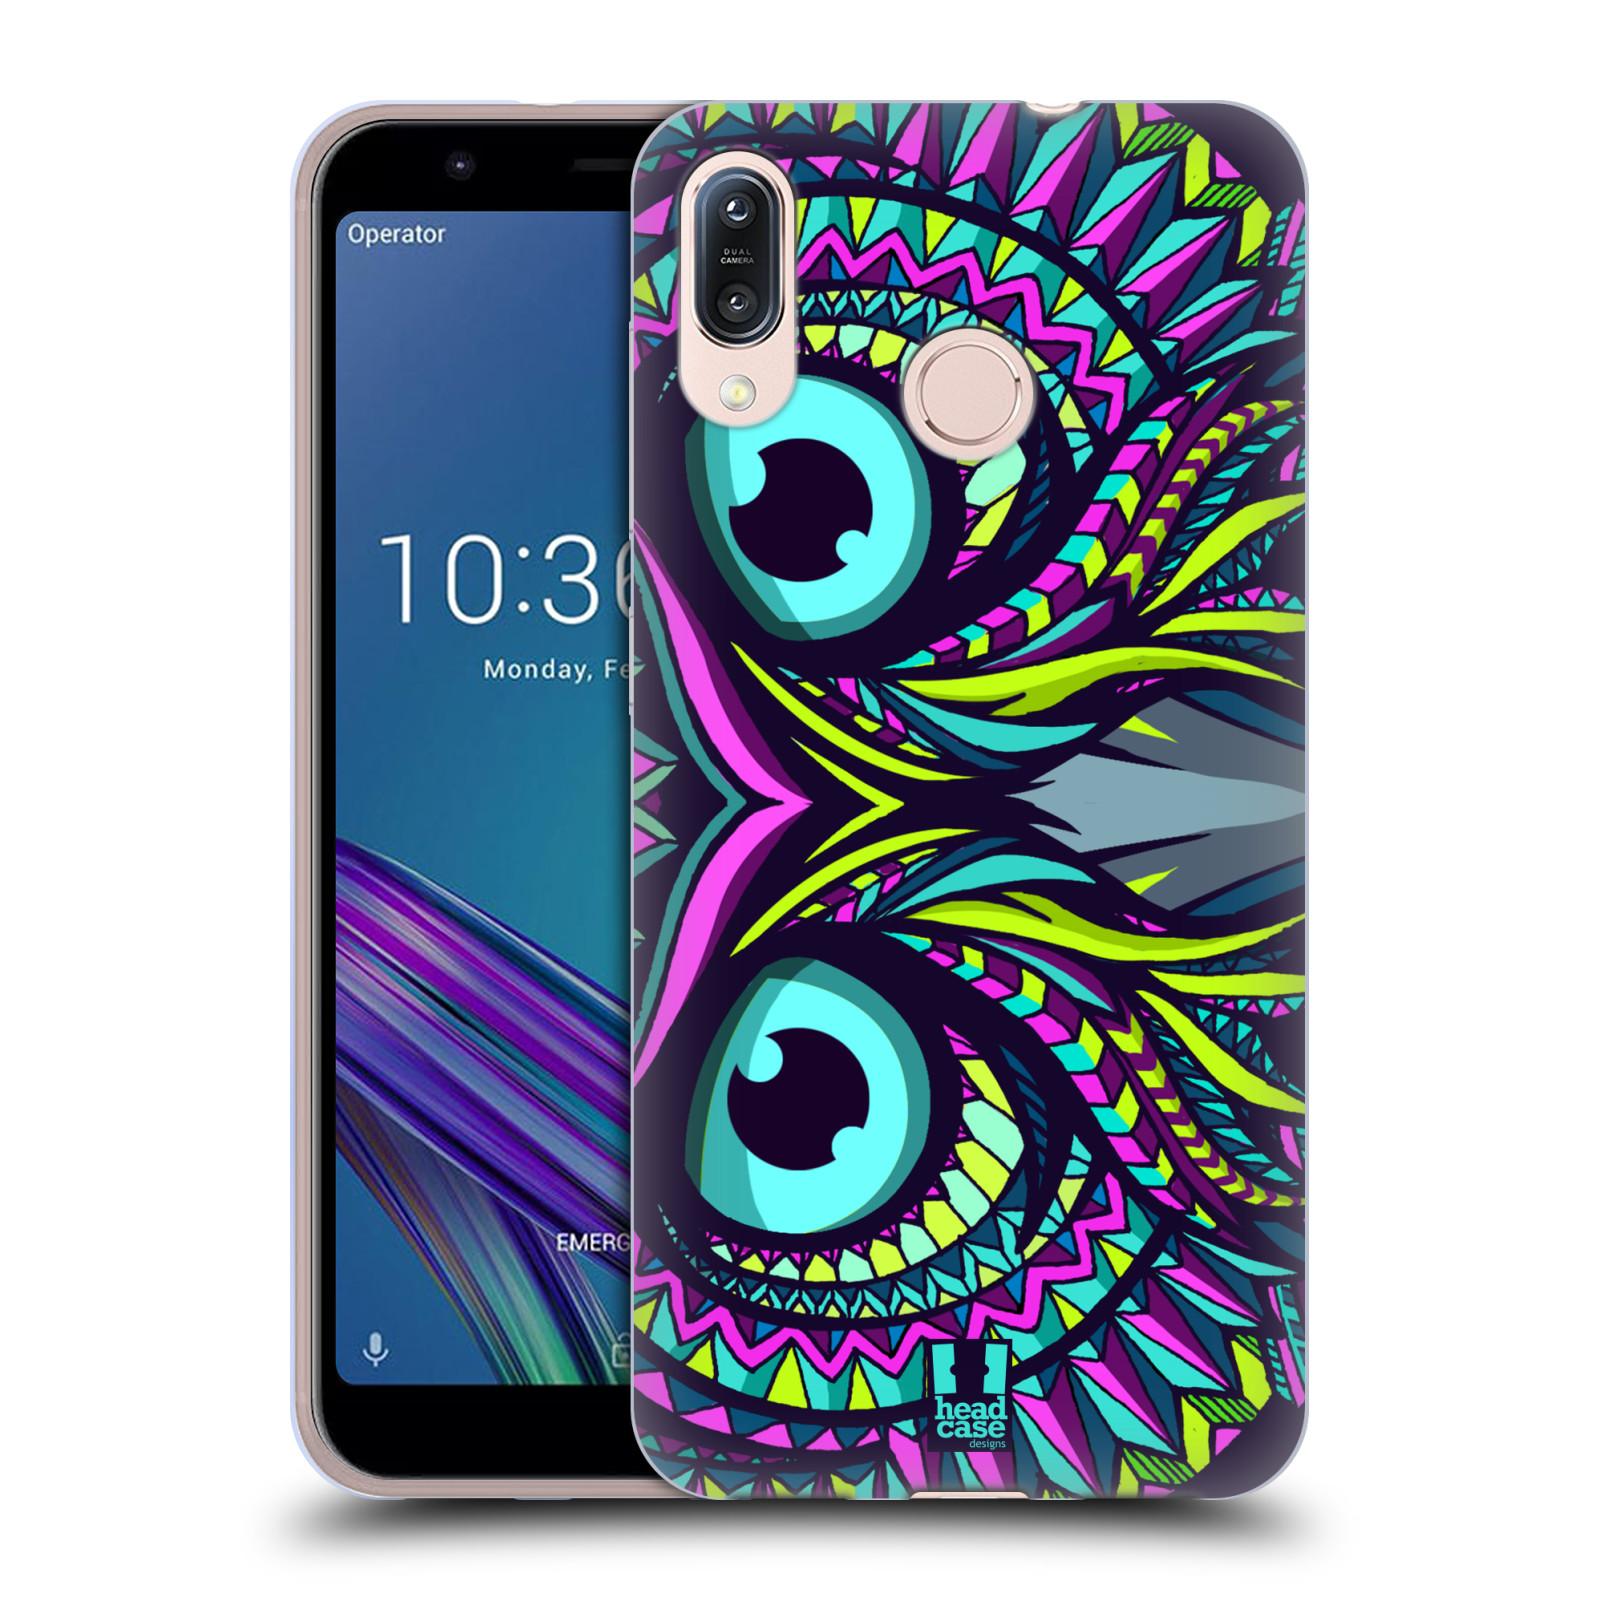 Silikonové pouzdro na mobil Asus Zenfone Max M1 ZB555KL - Head Case - AZTEC SOVA